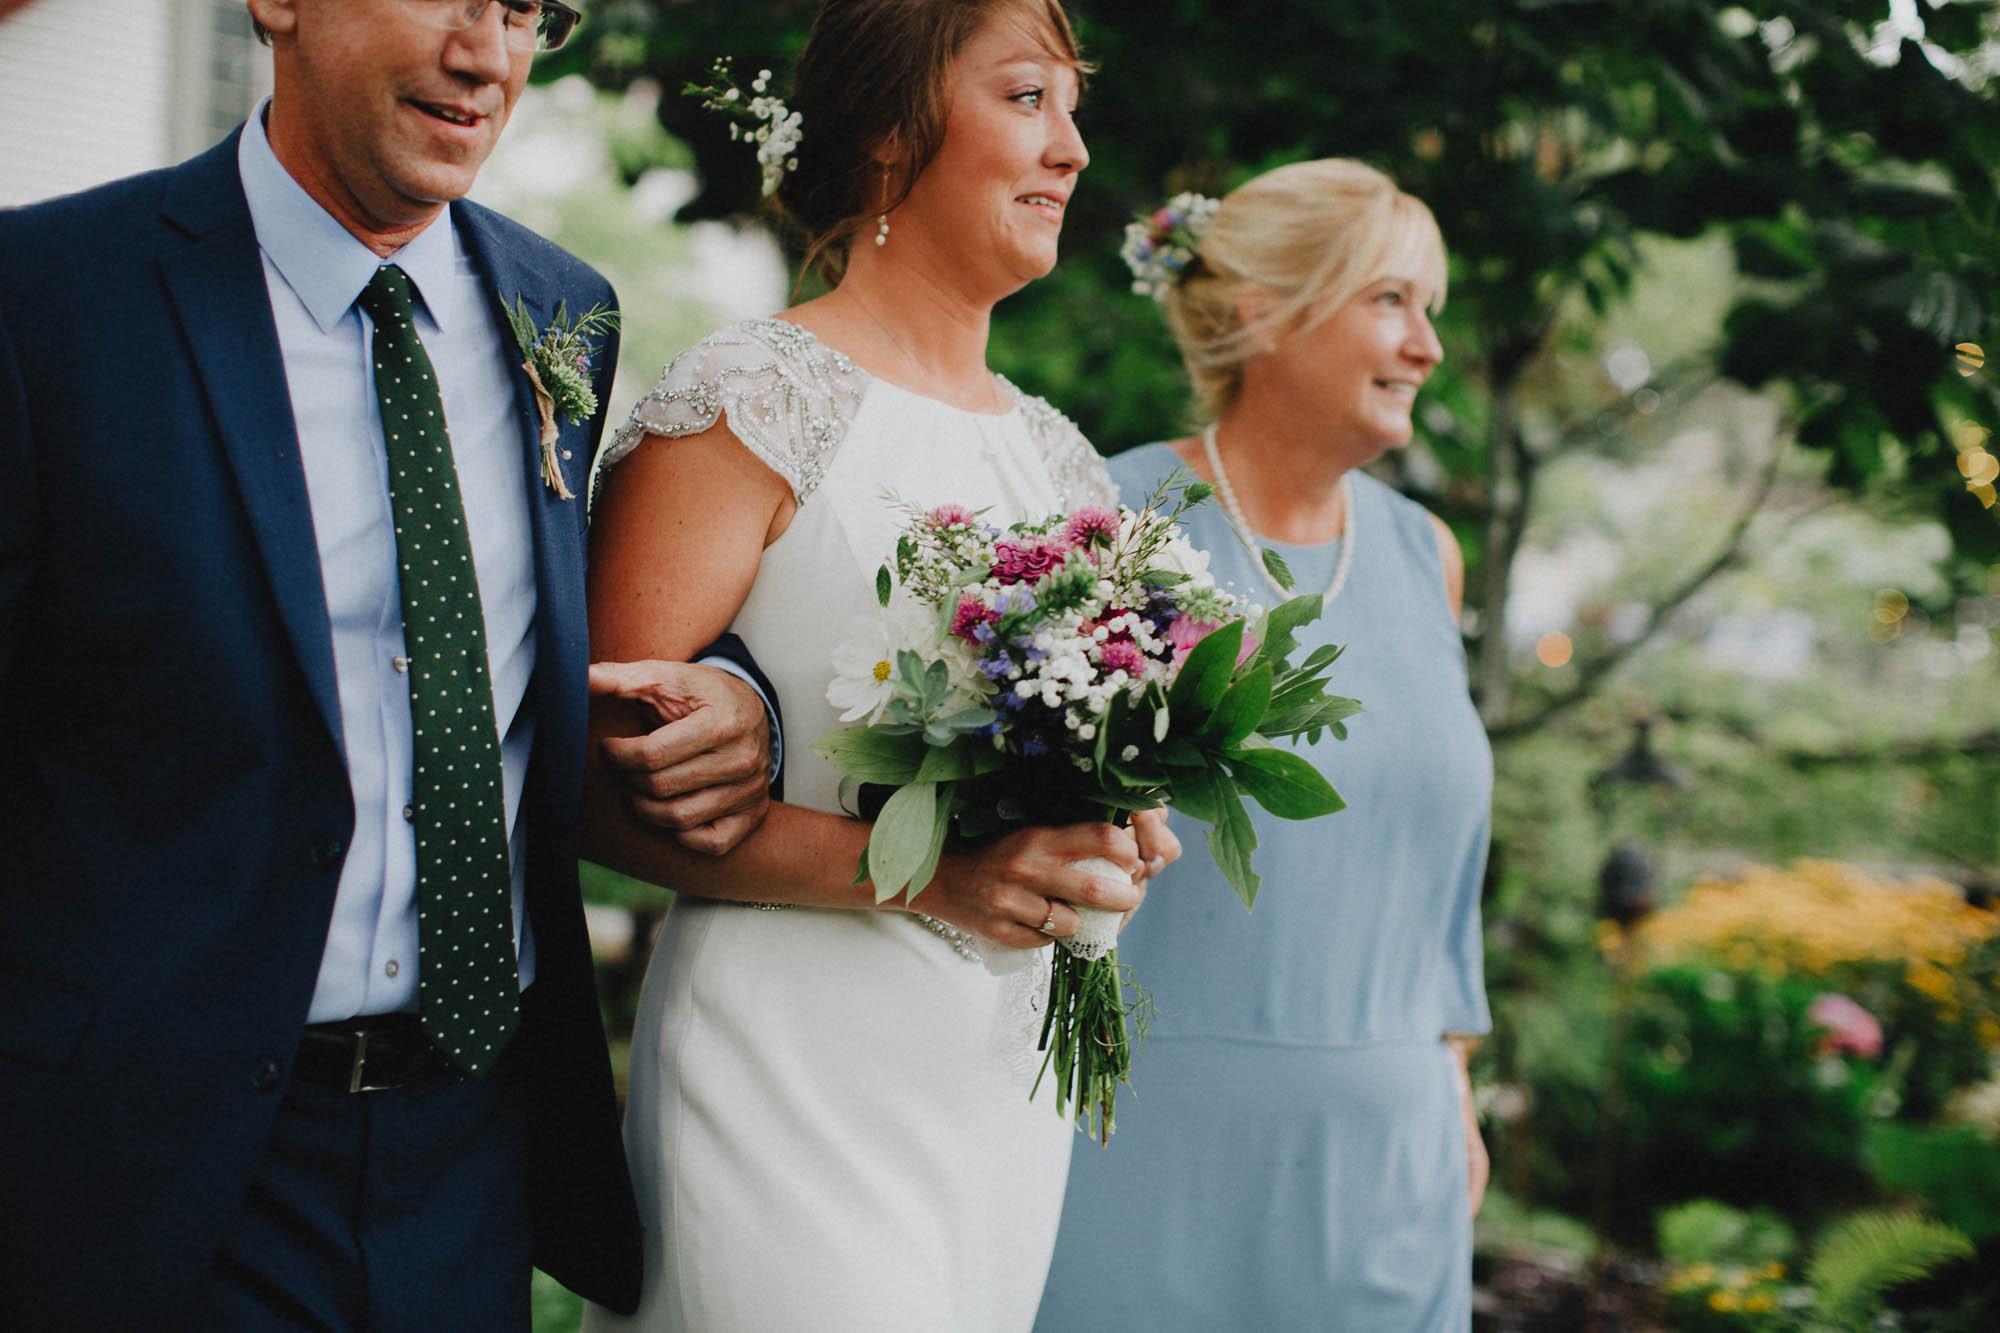 Leah-Graham-Michigan-Outdoor-DIY-Wedding-044@2x.jpg